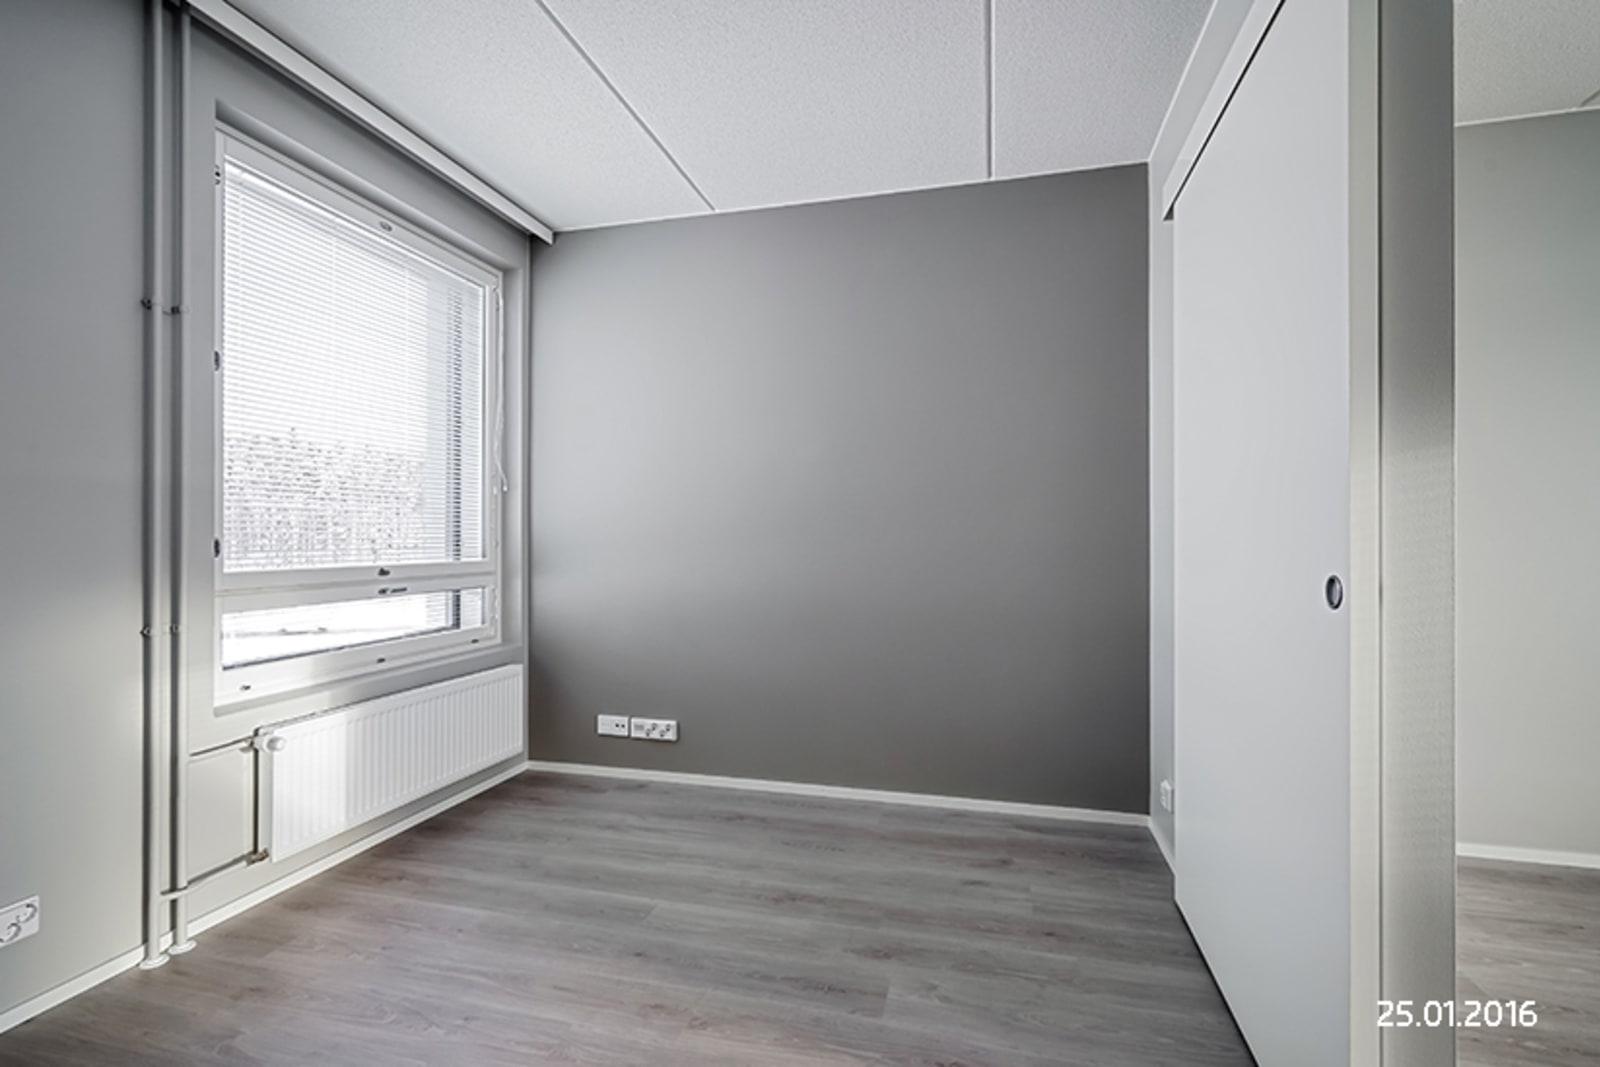 Espoo, Saunalahti, Magneettikatu 8 A 018